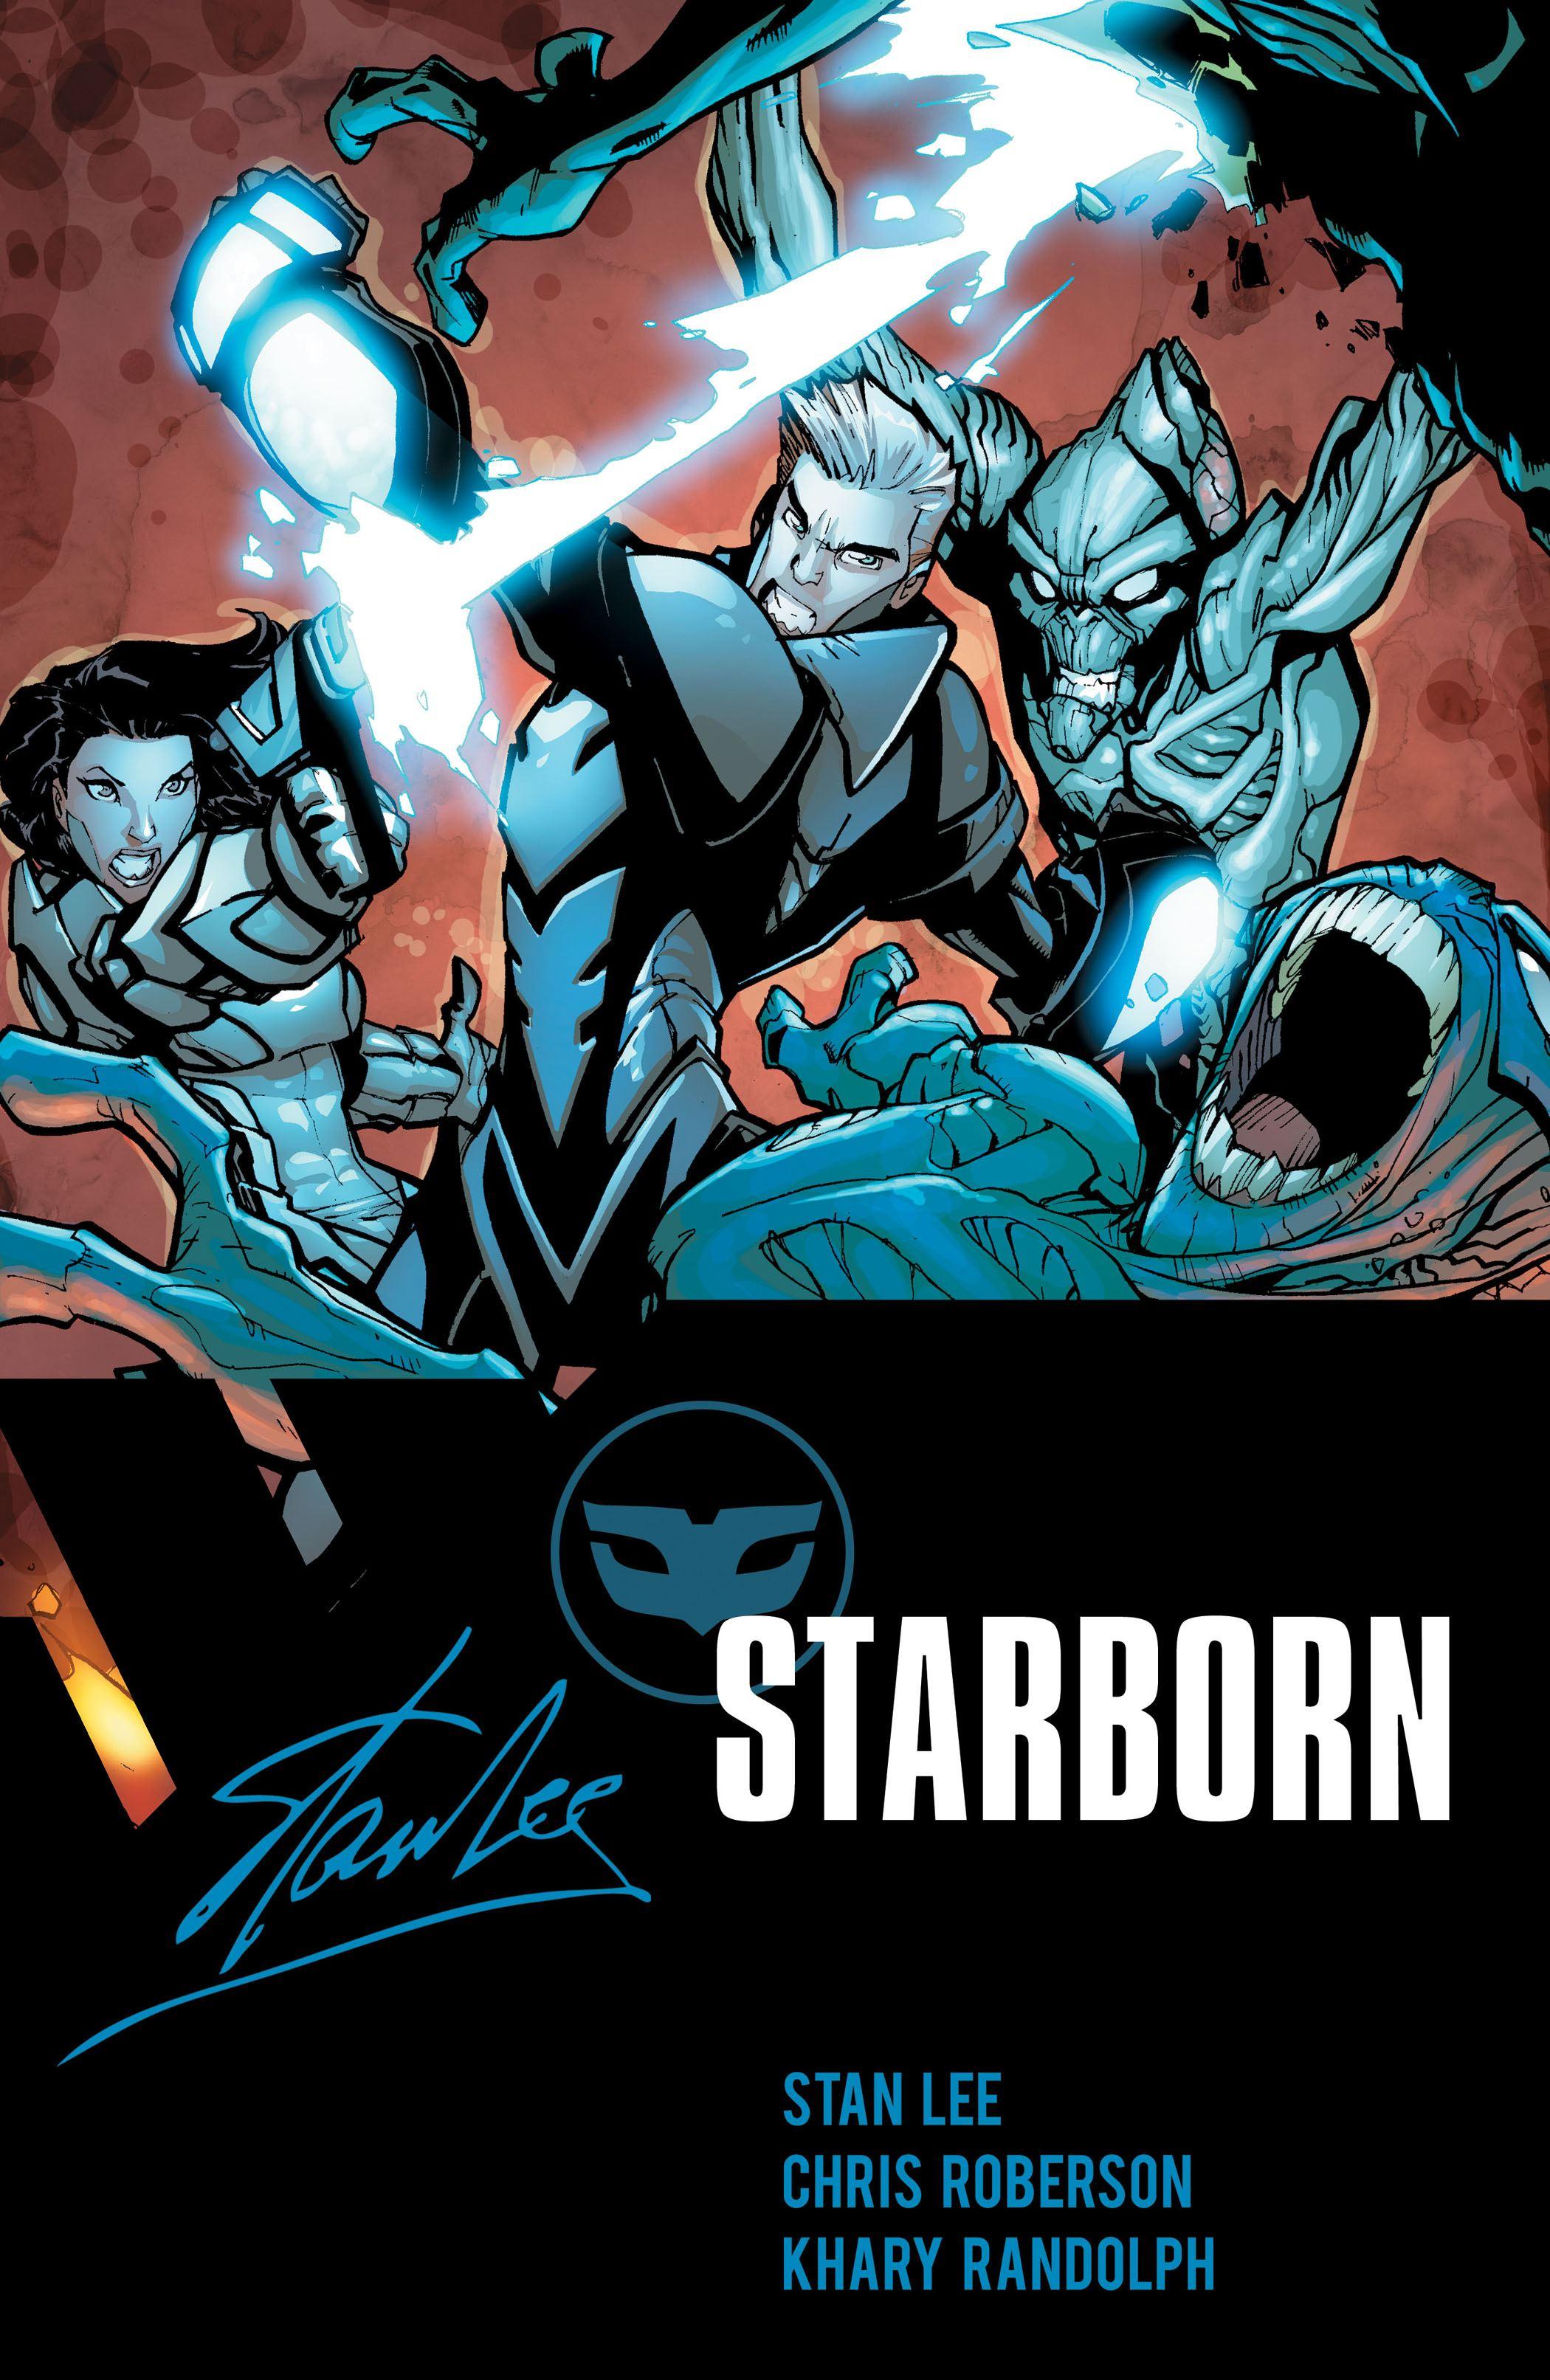 Starborn vol 2 9781608860647 hr